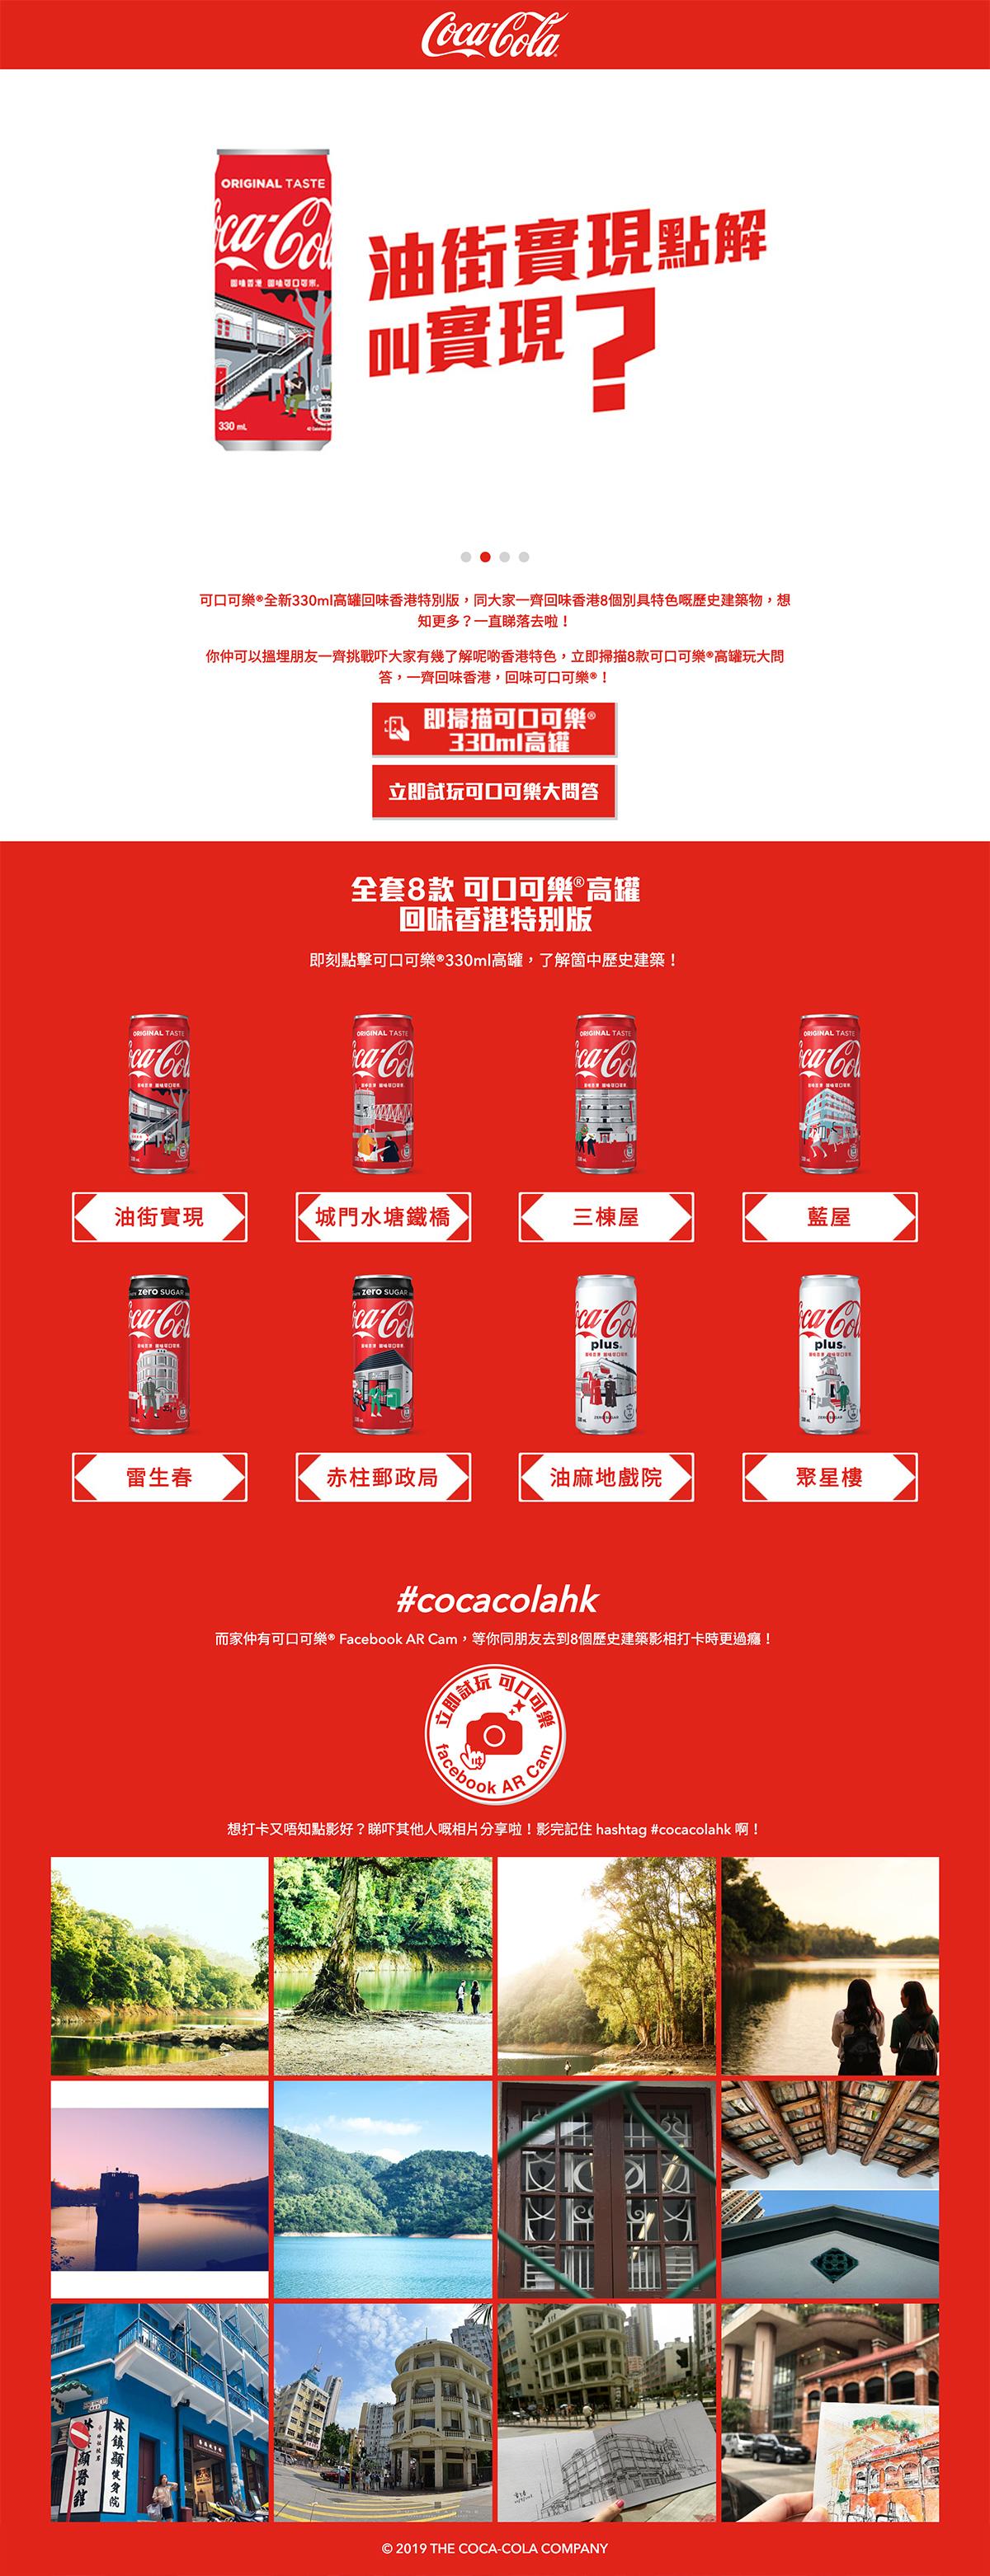 coke_01